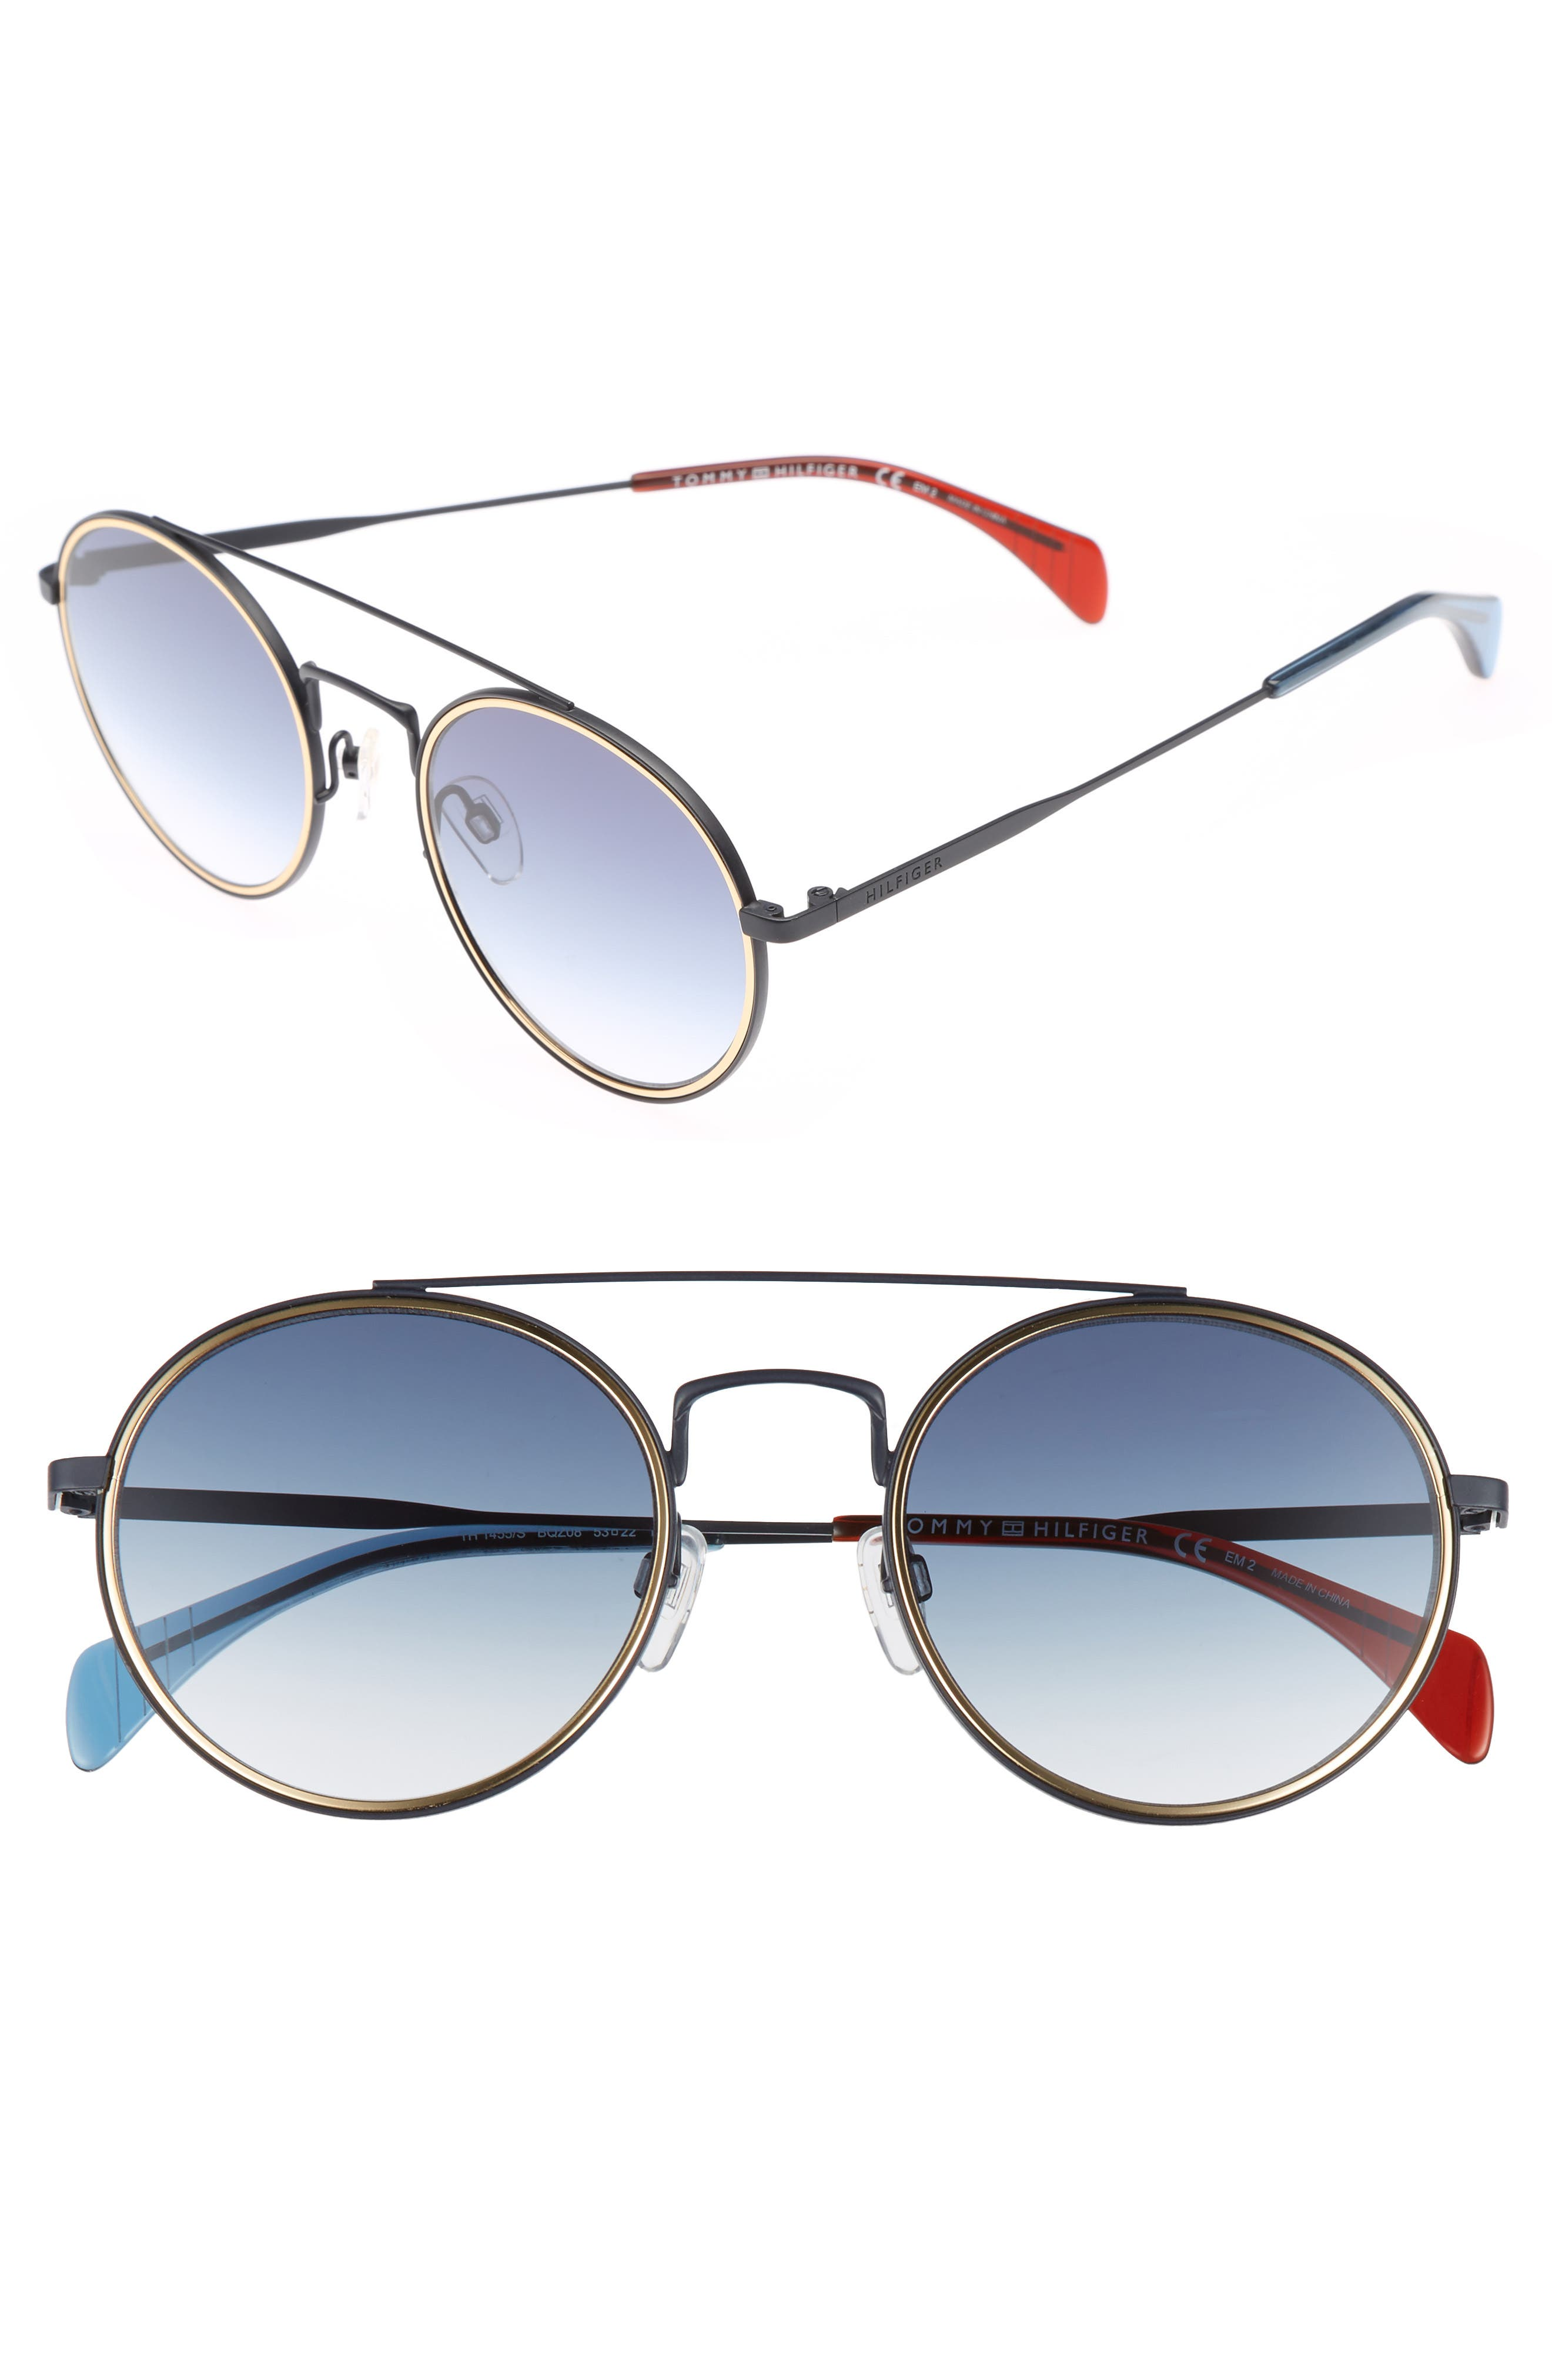 Main Image - Tommy Hilfiger 53mm Round Sunglasses